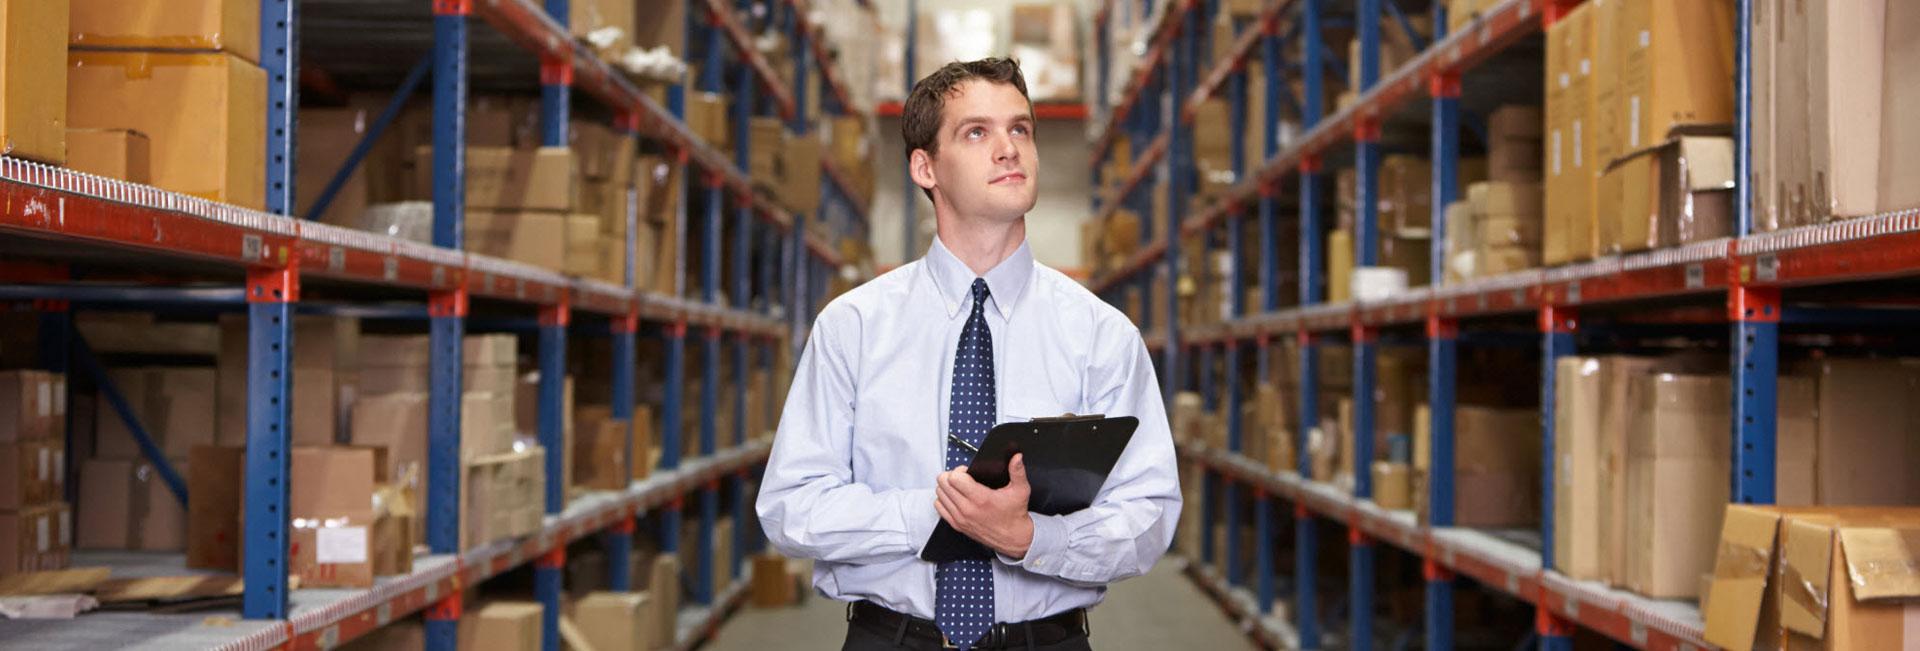 Managed-warehousing